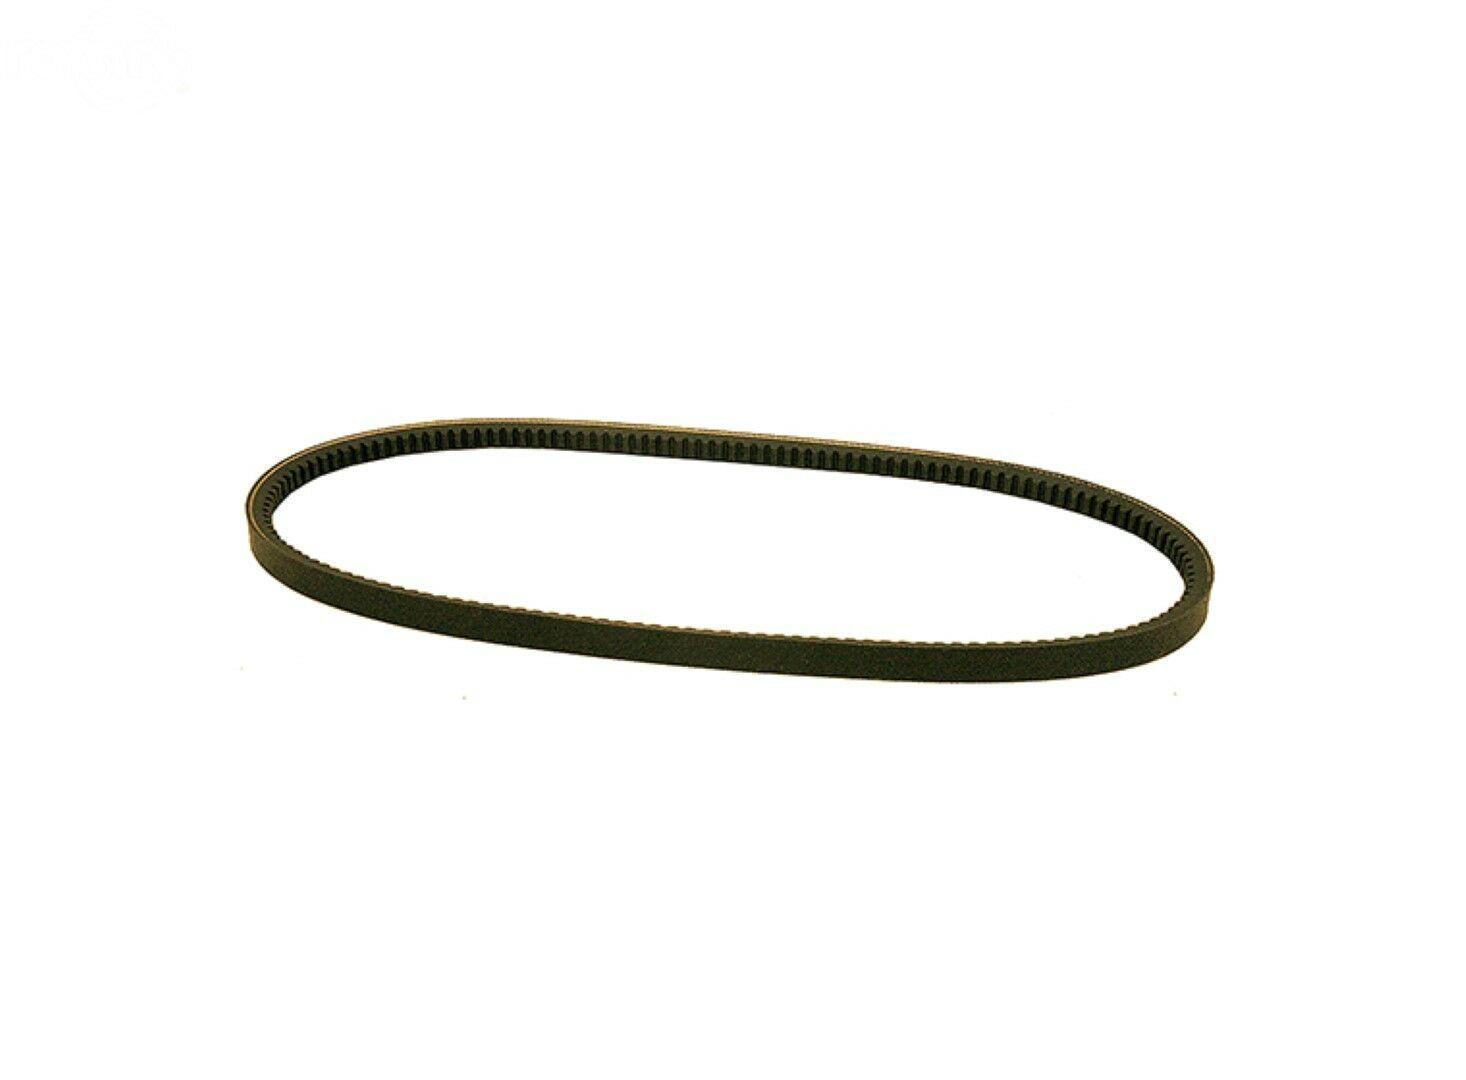 "Drive Belt Toro Exmark 116-7116 Turf Master 30"", ECKA30 30""  Aftermarket - $16.78"